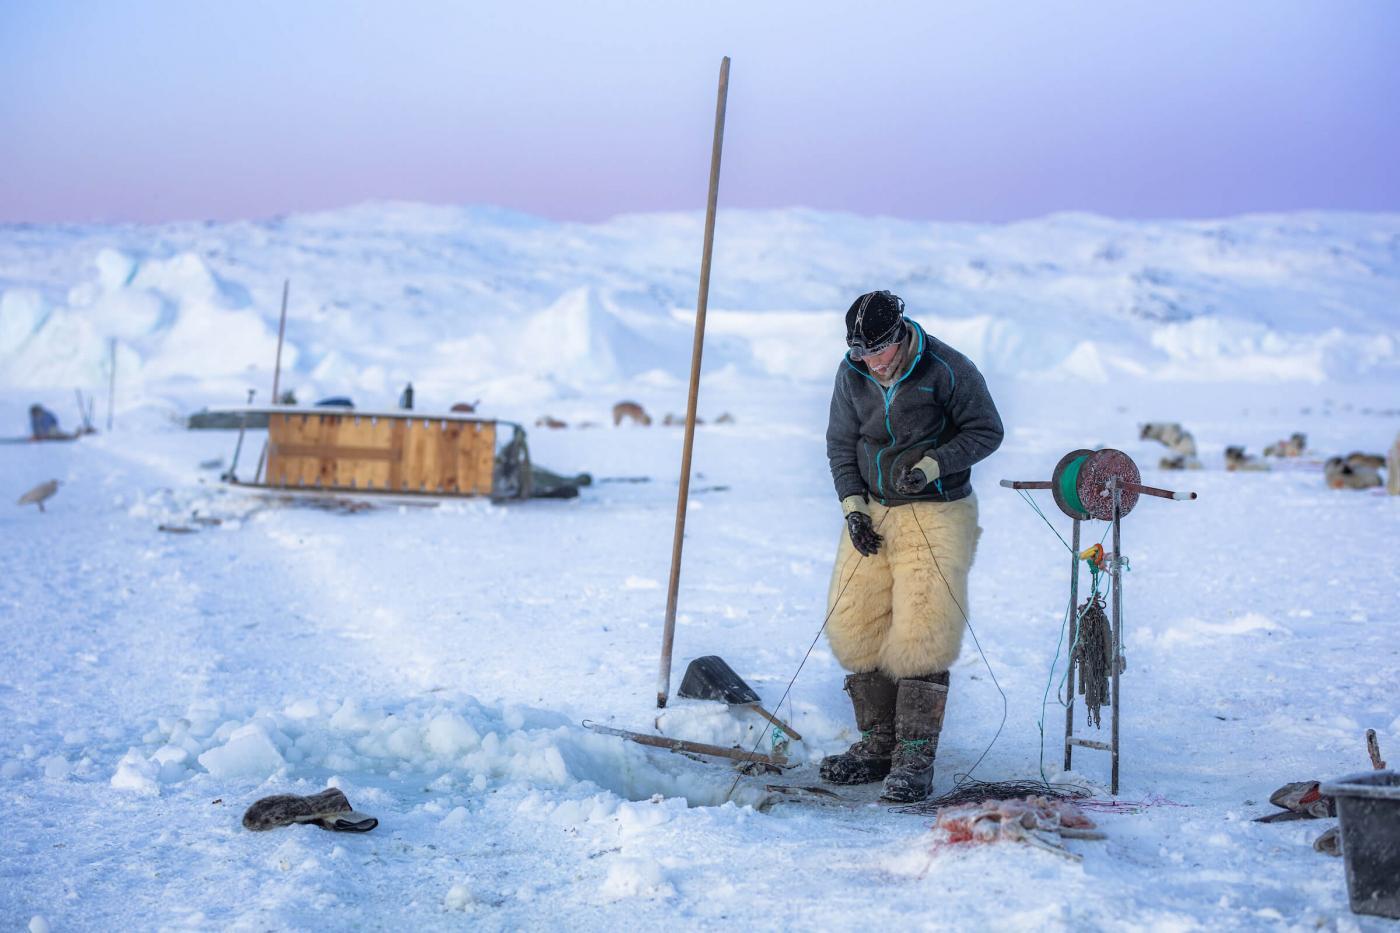 Ice fishing area. Photo - Aningaaq R. Carlsen, Visit Greenland